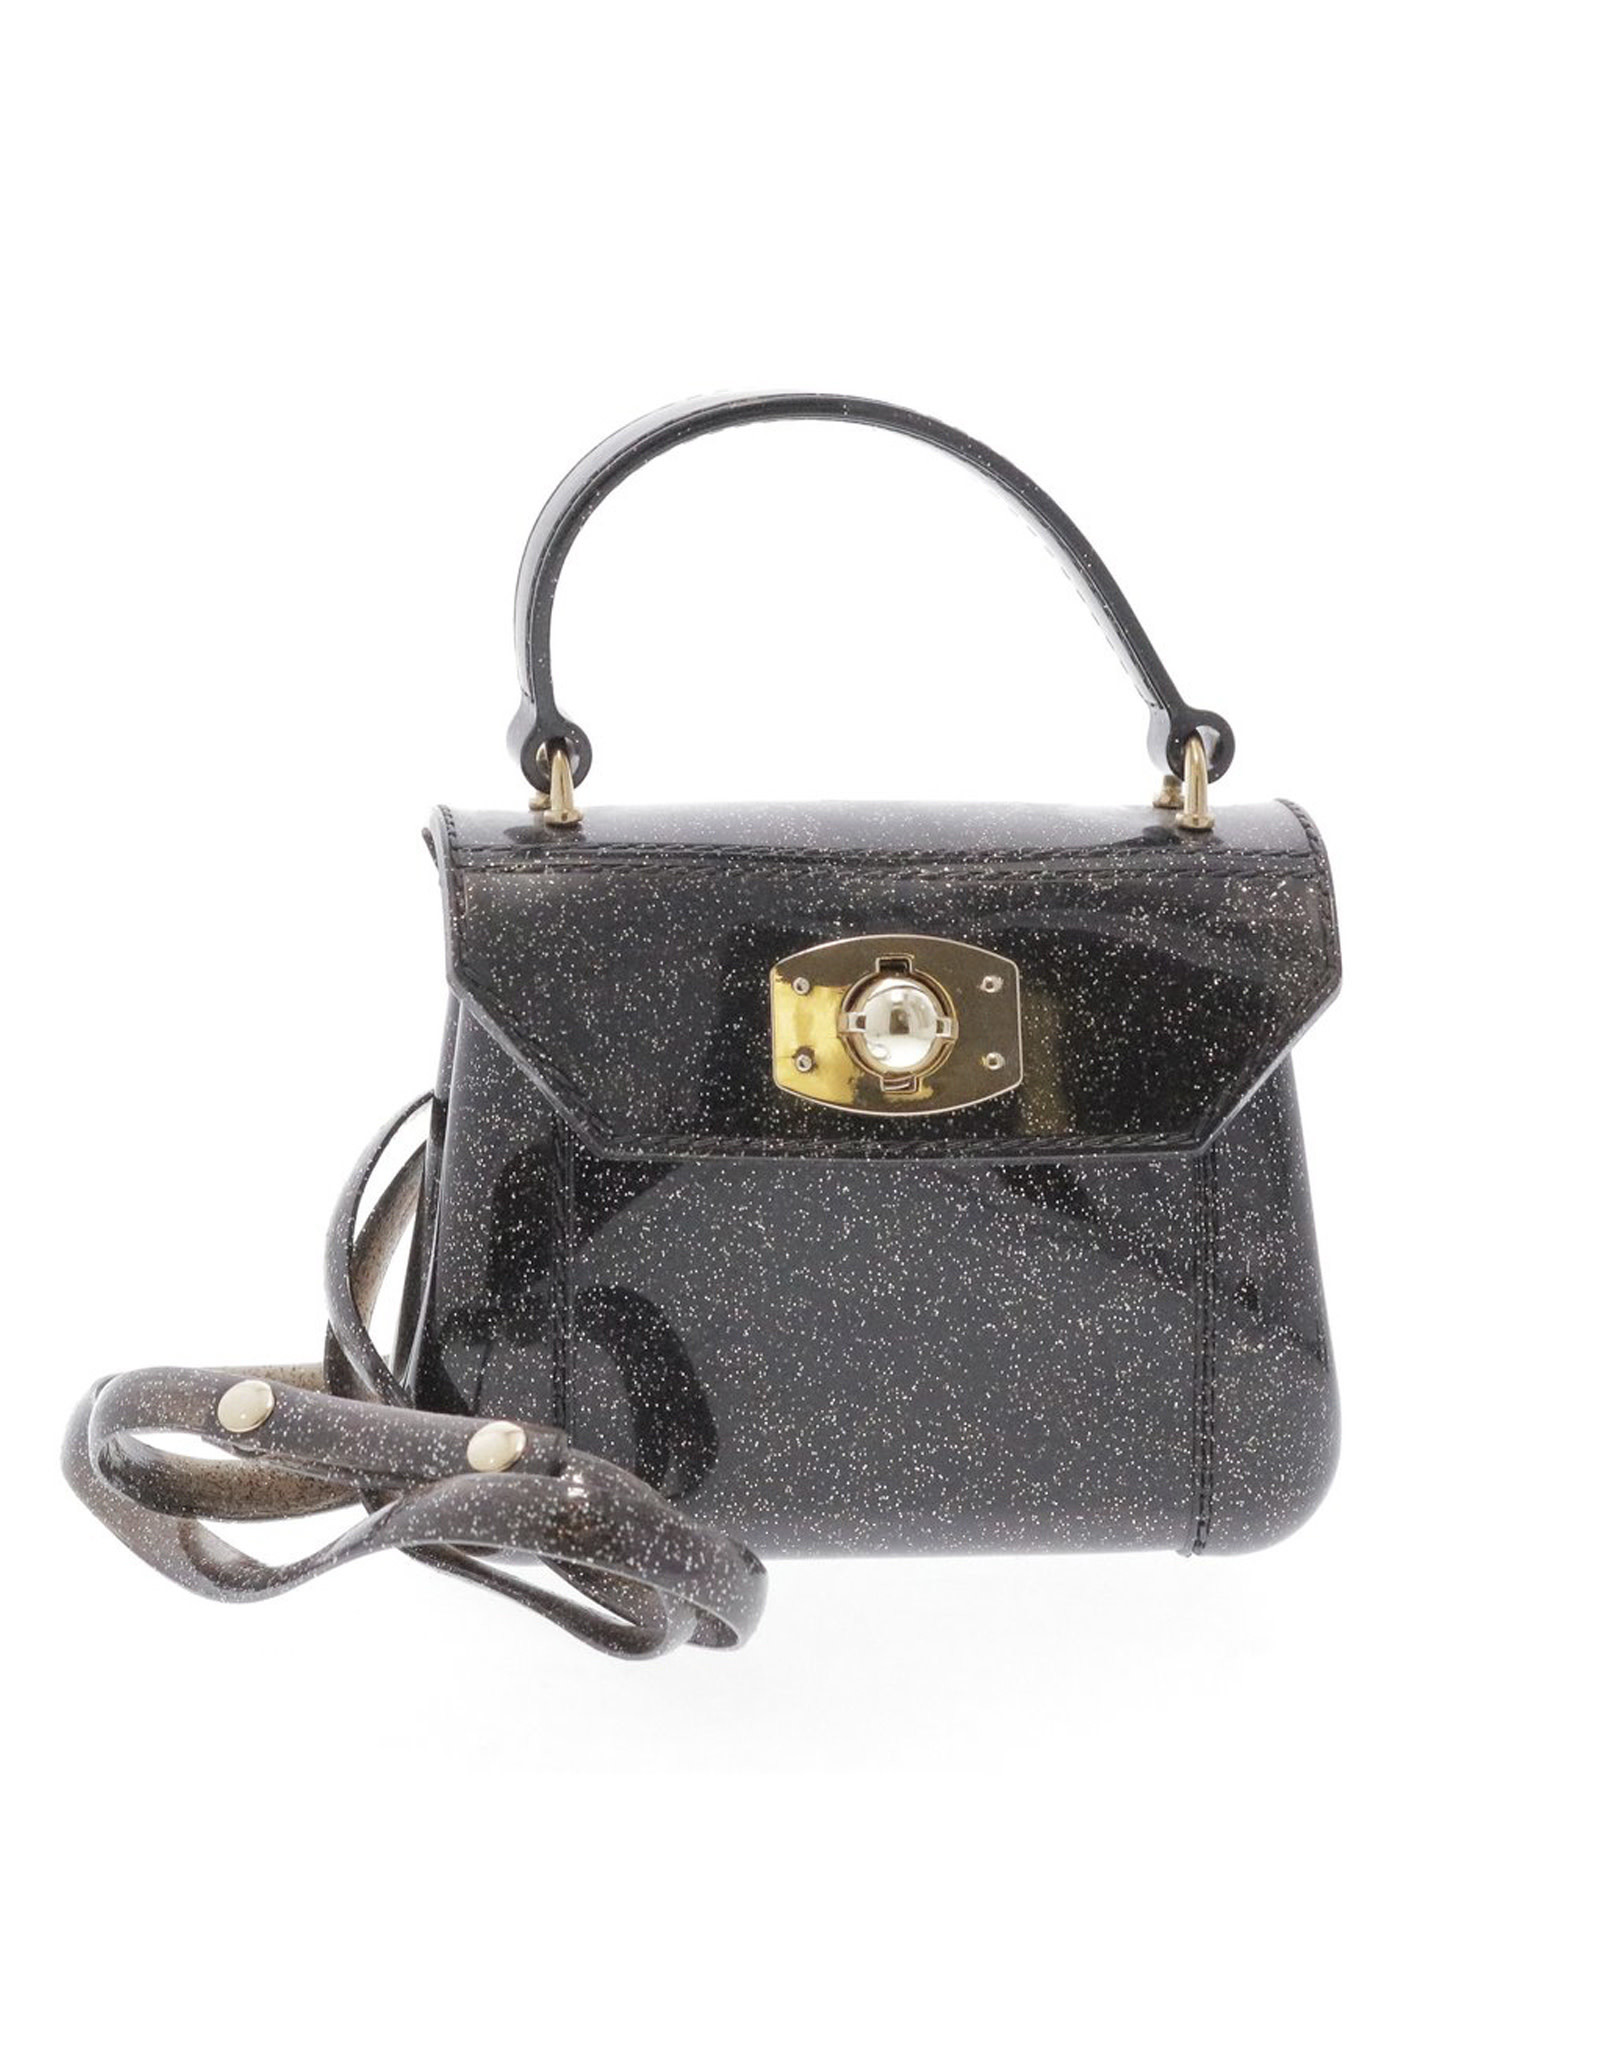 Doe a Dear Black Glitter Jelly Bag